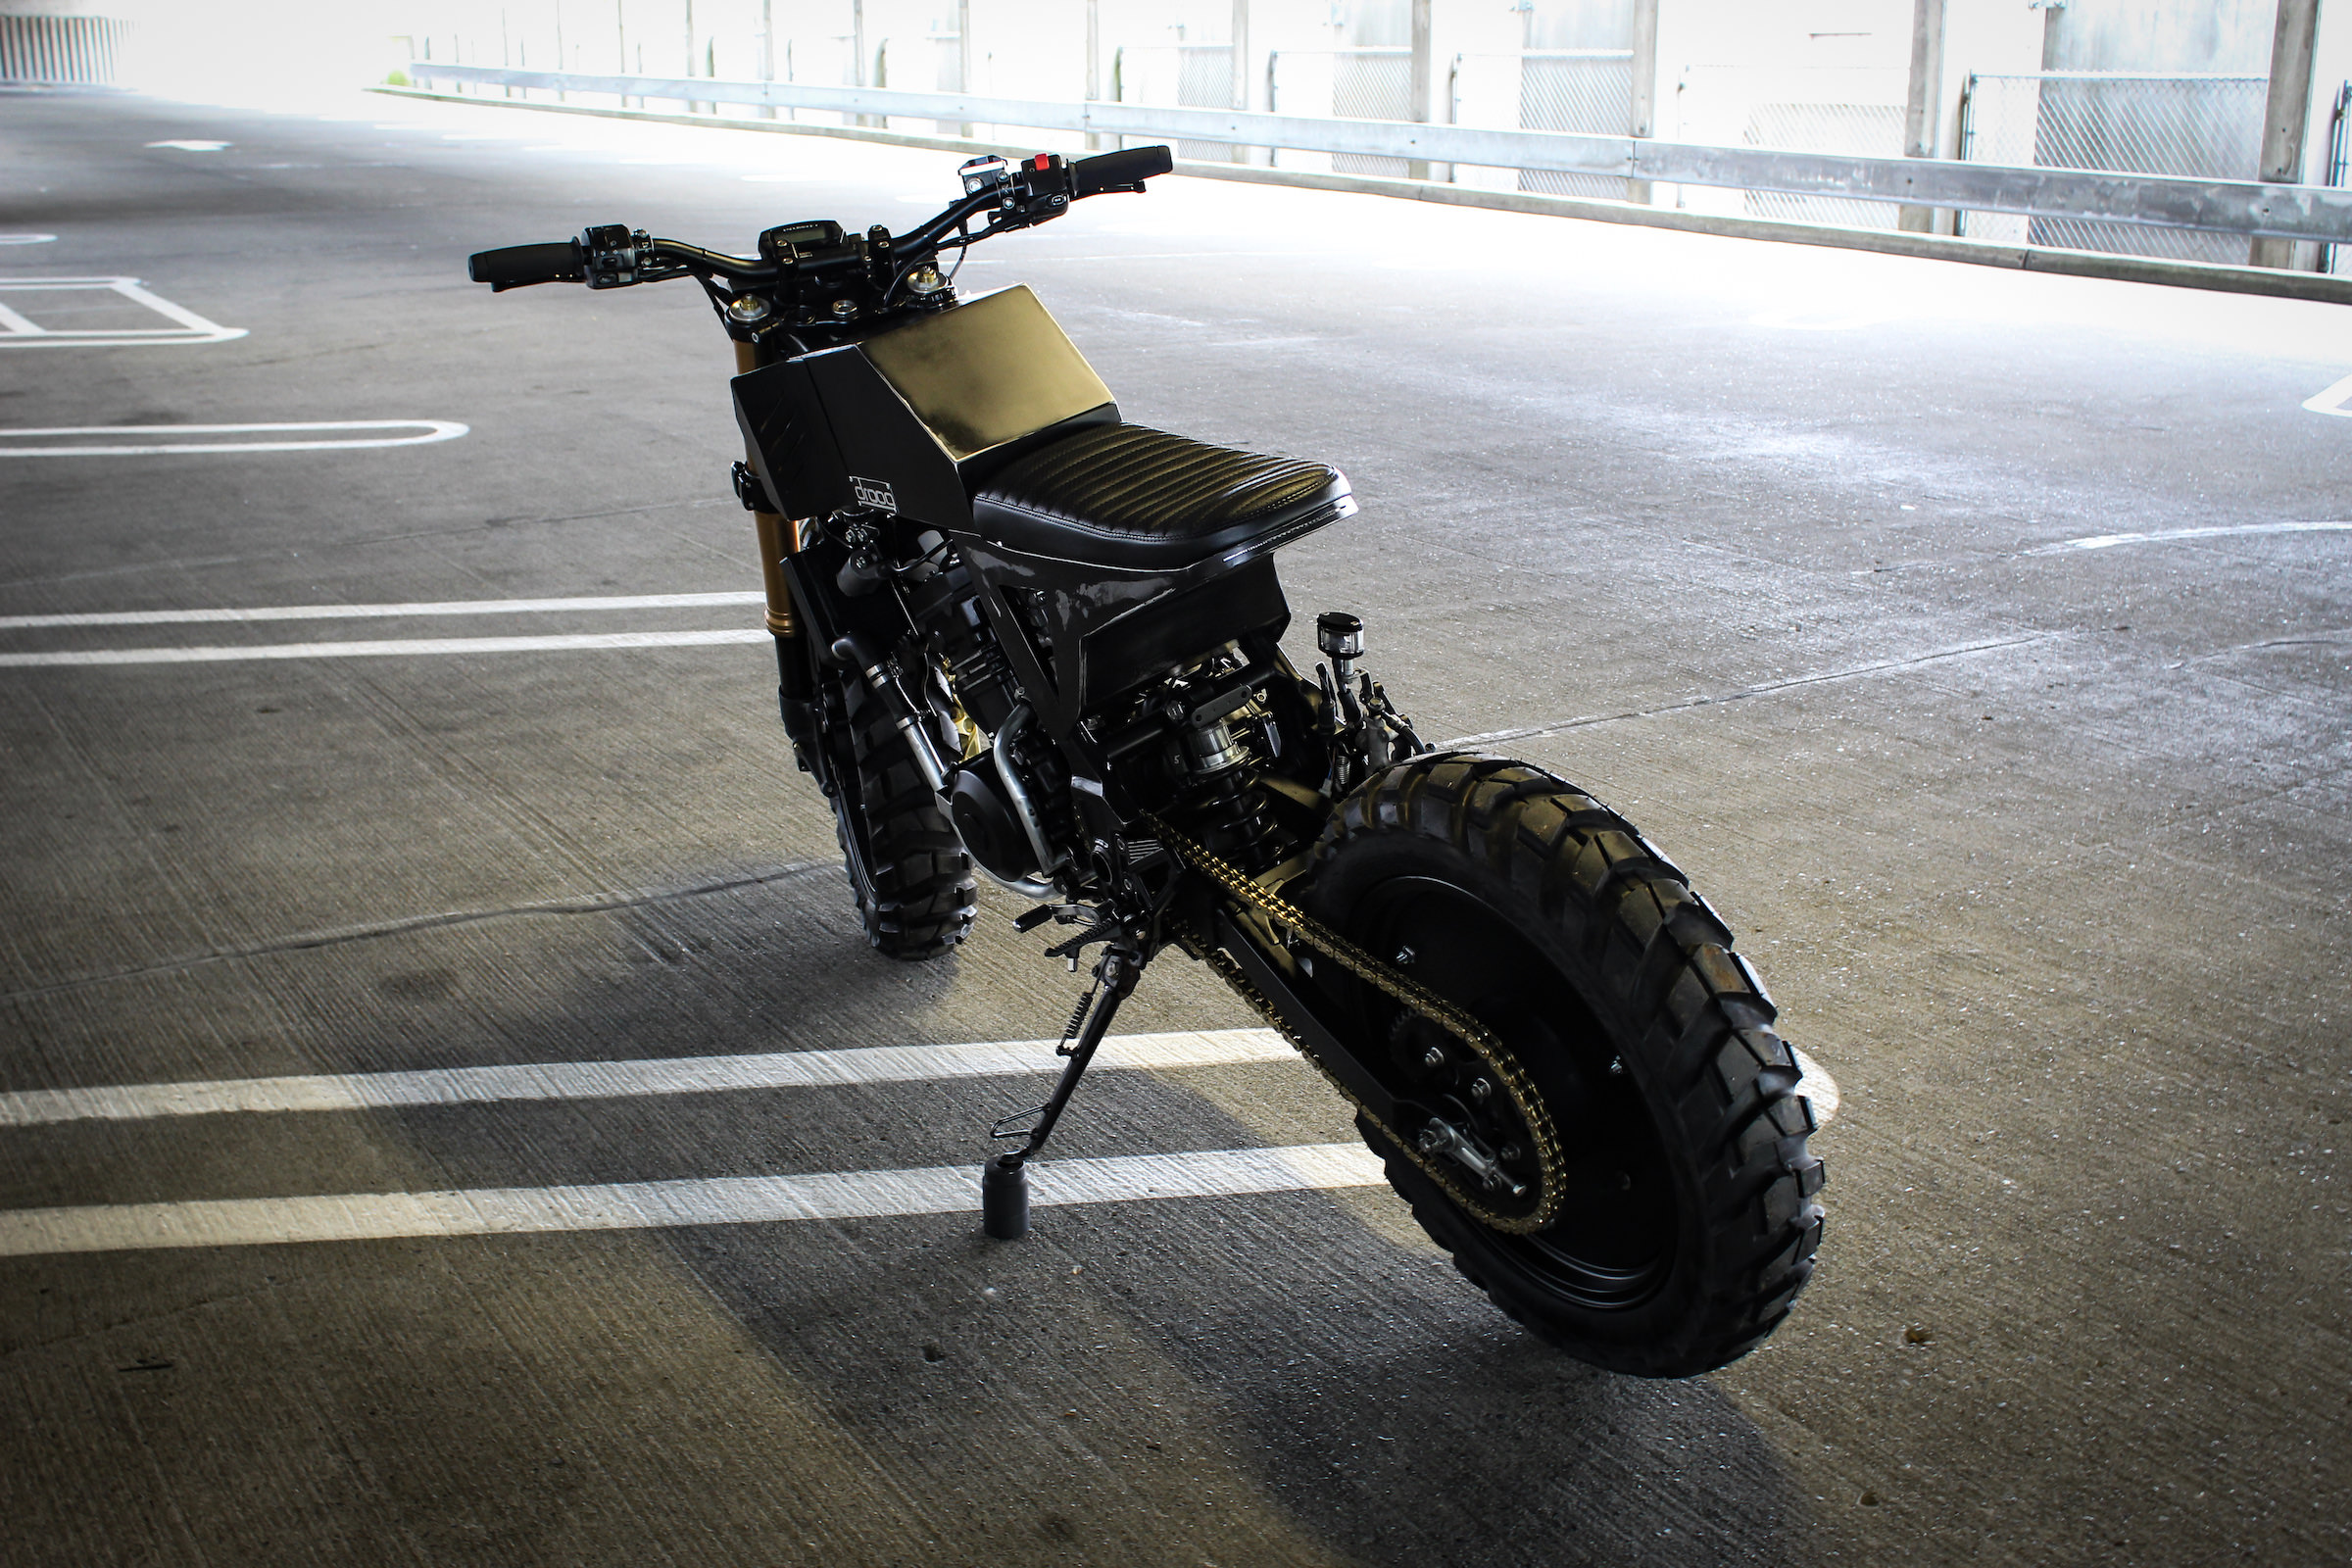 The Droog Moto Custom Kawasaki Ninja 250 R Scrambler x